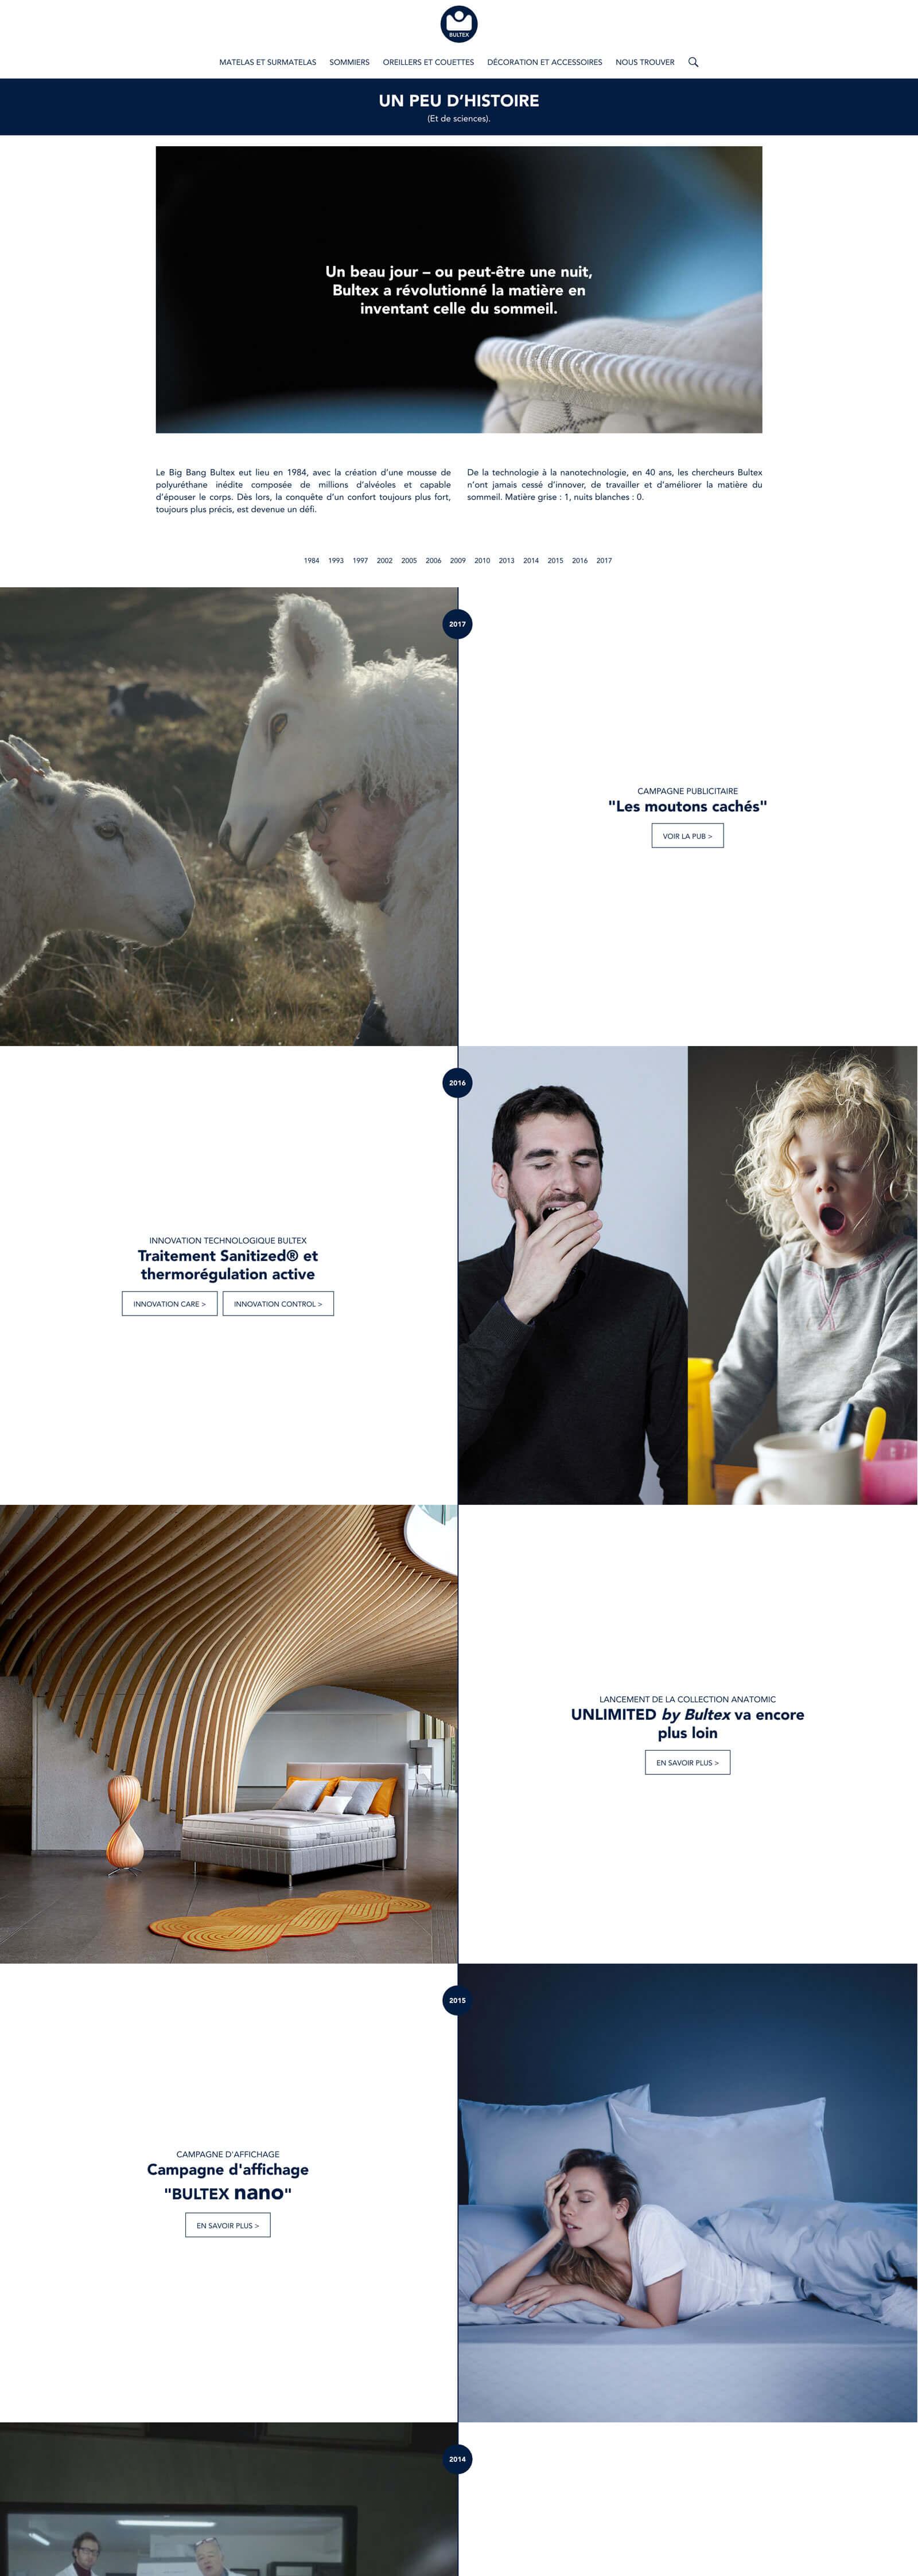 bultex site web